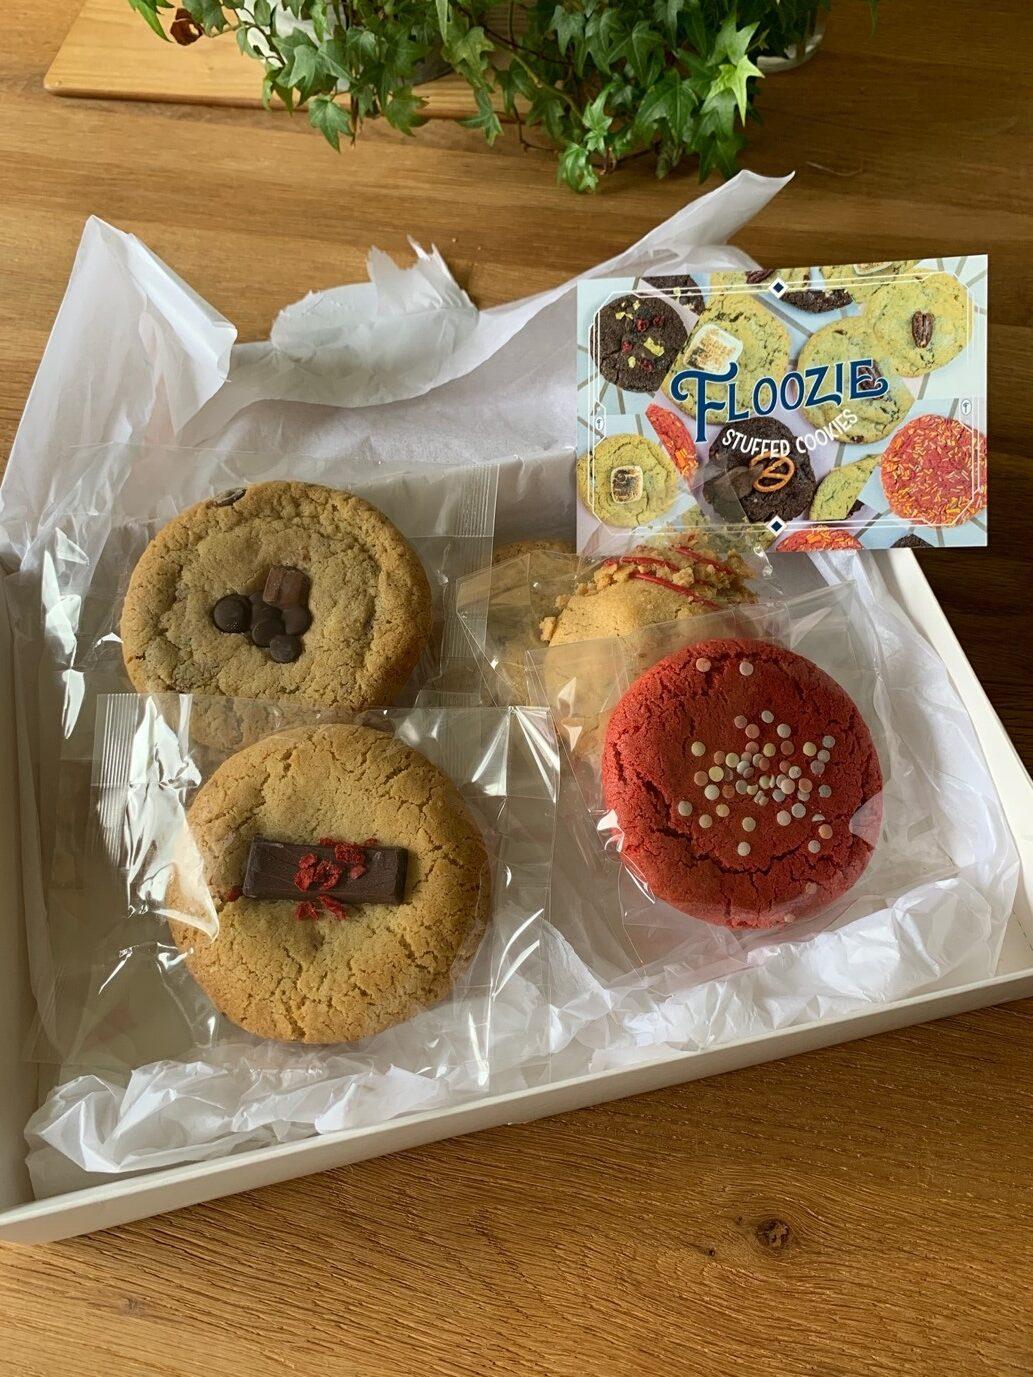 Floozie stuffed cookies